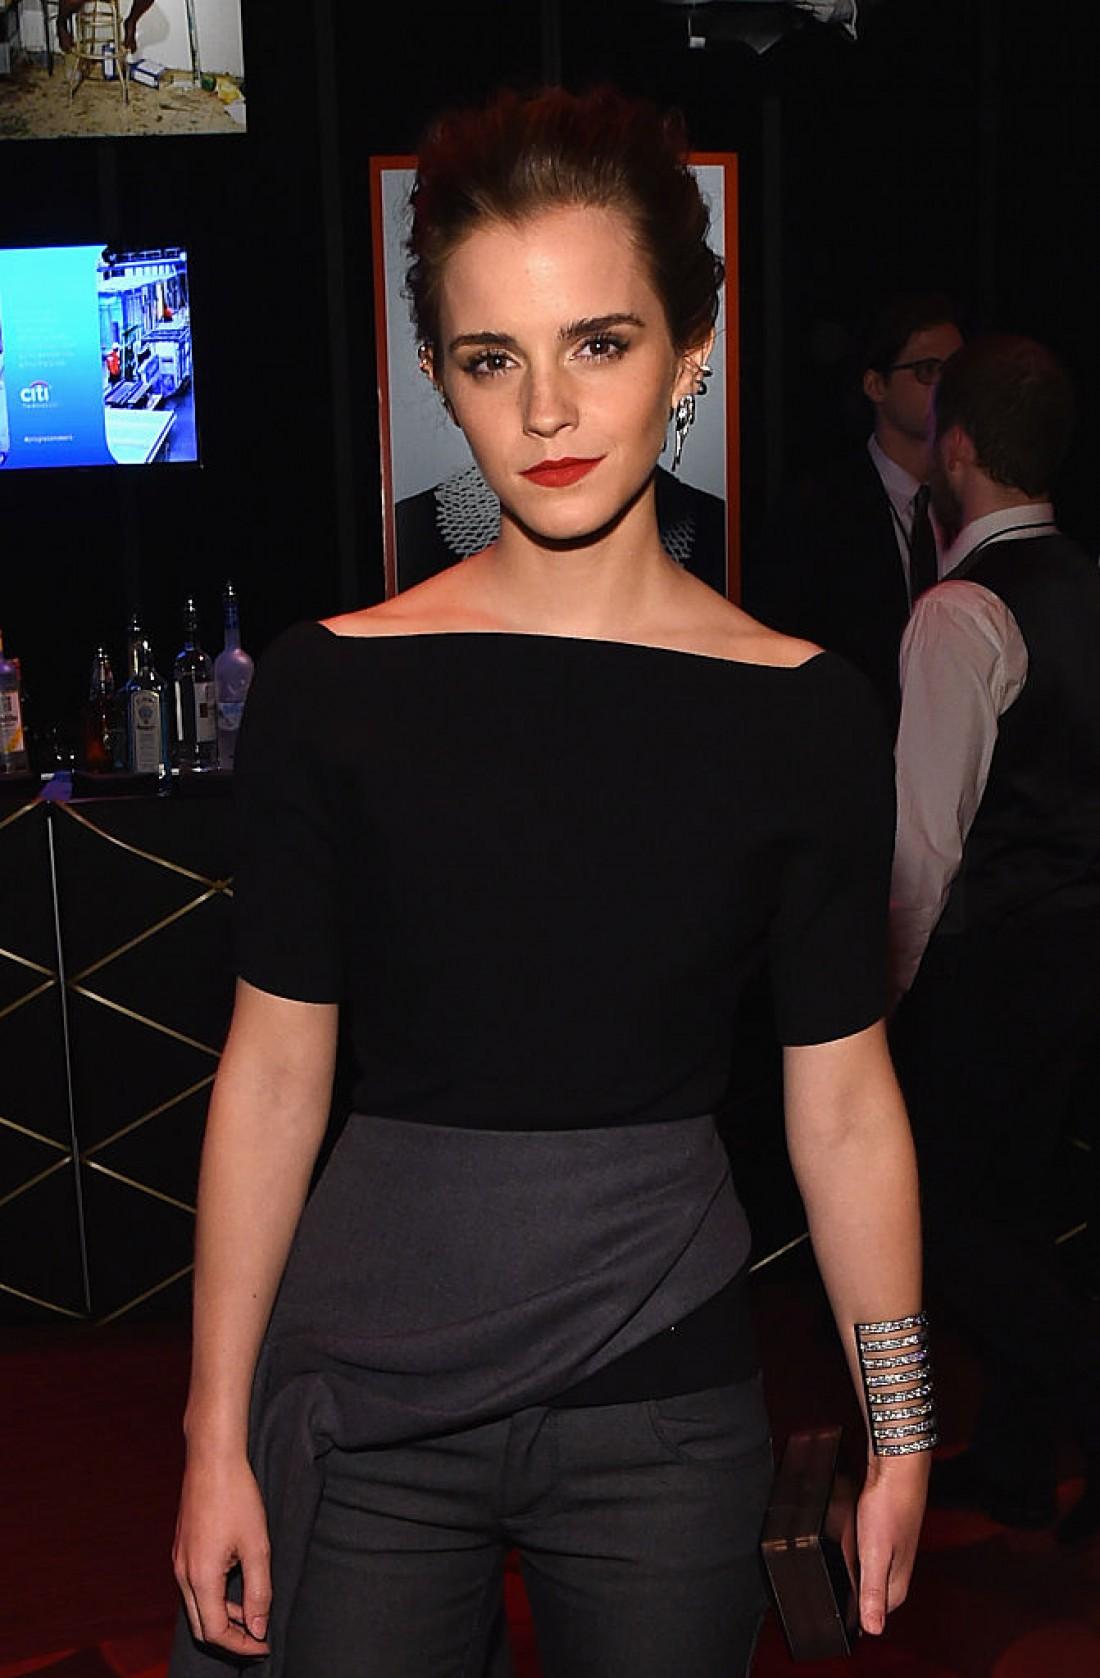 26-летняя британская актриса